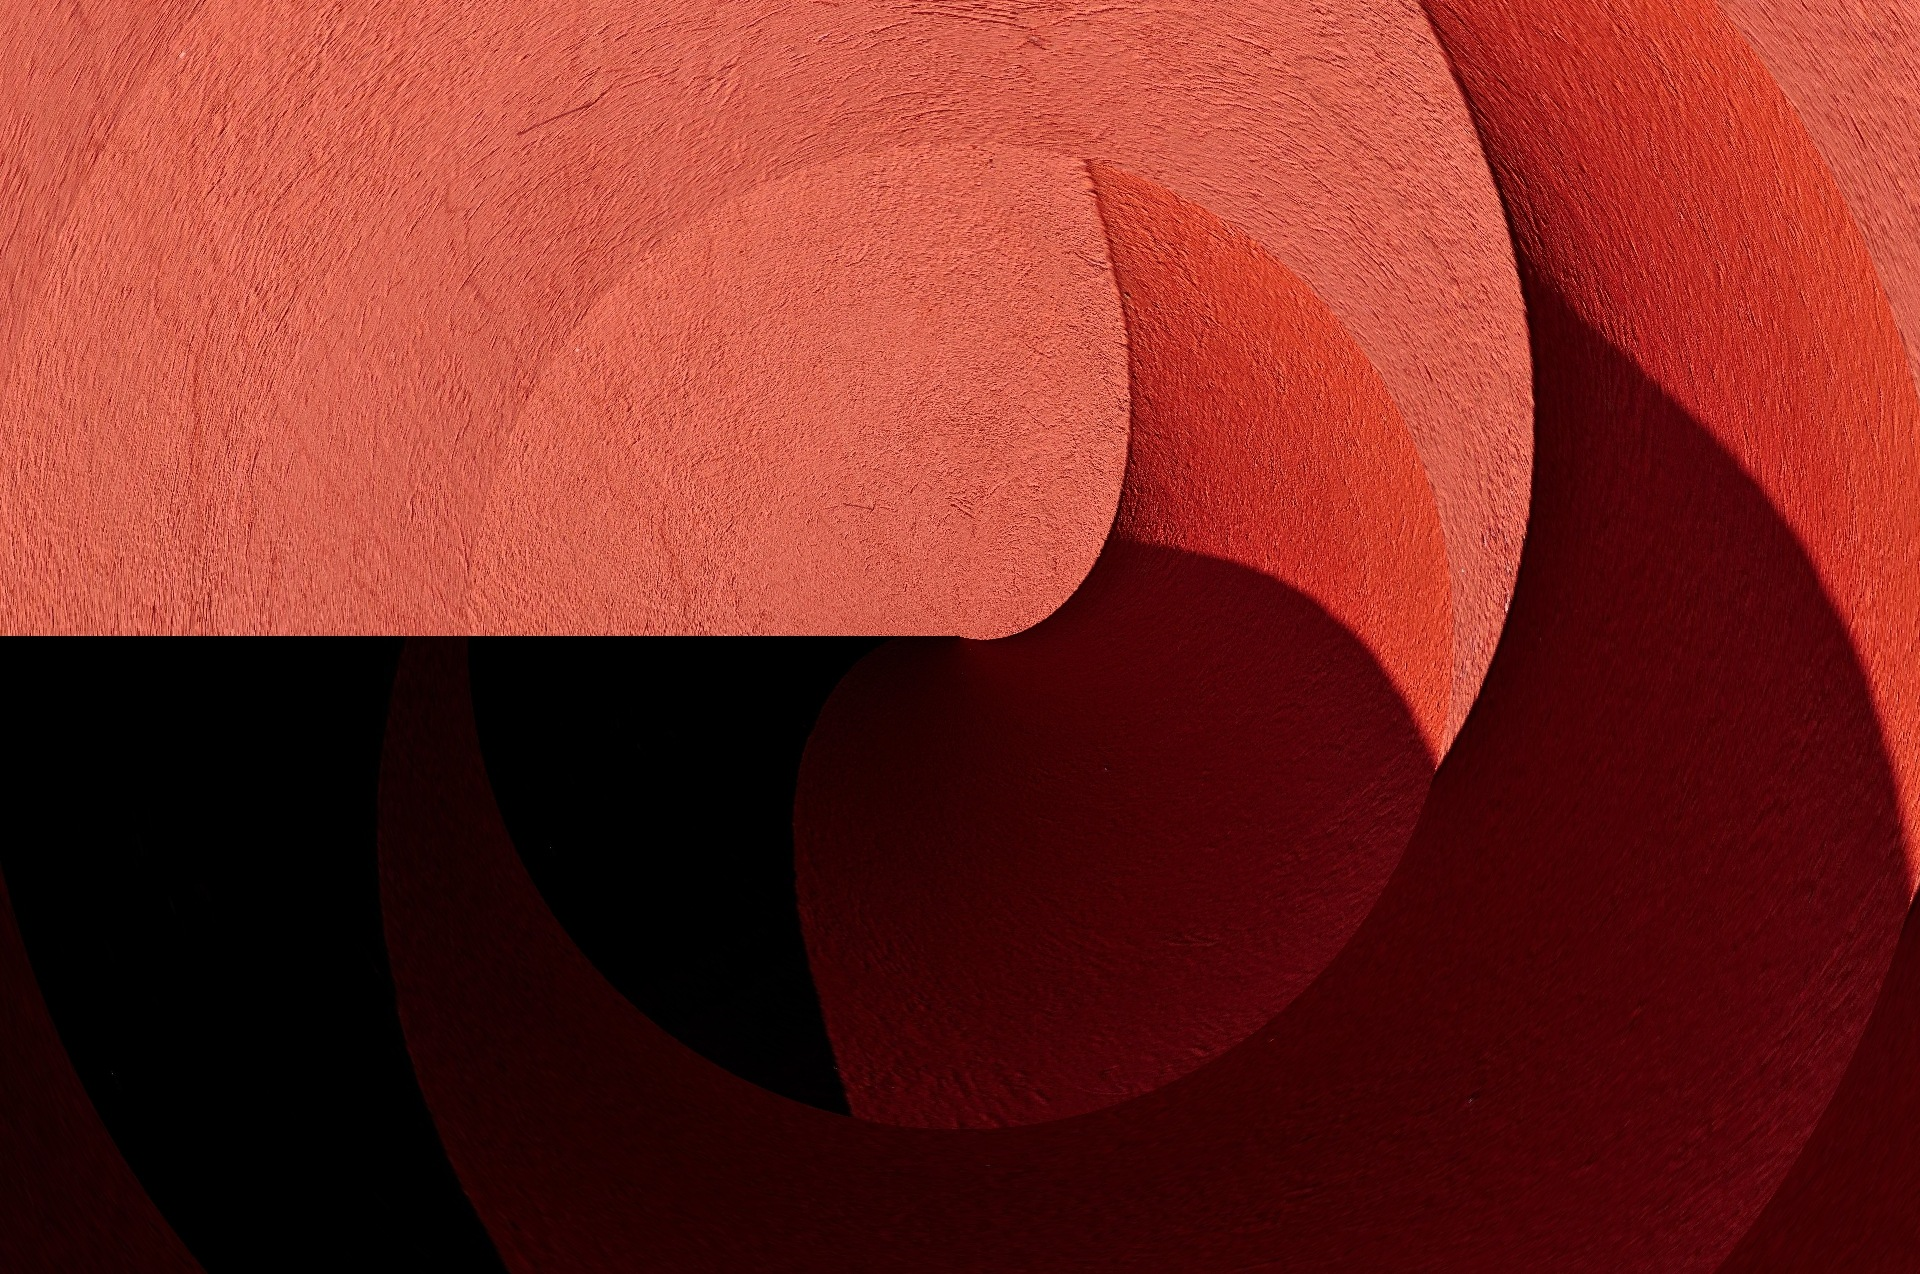 In red by José Evaldo Suassuna de Oliveira